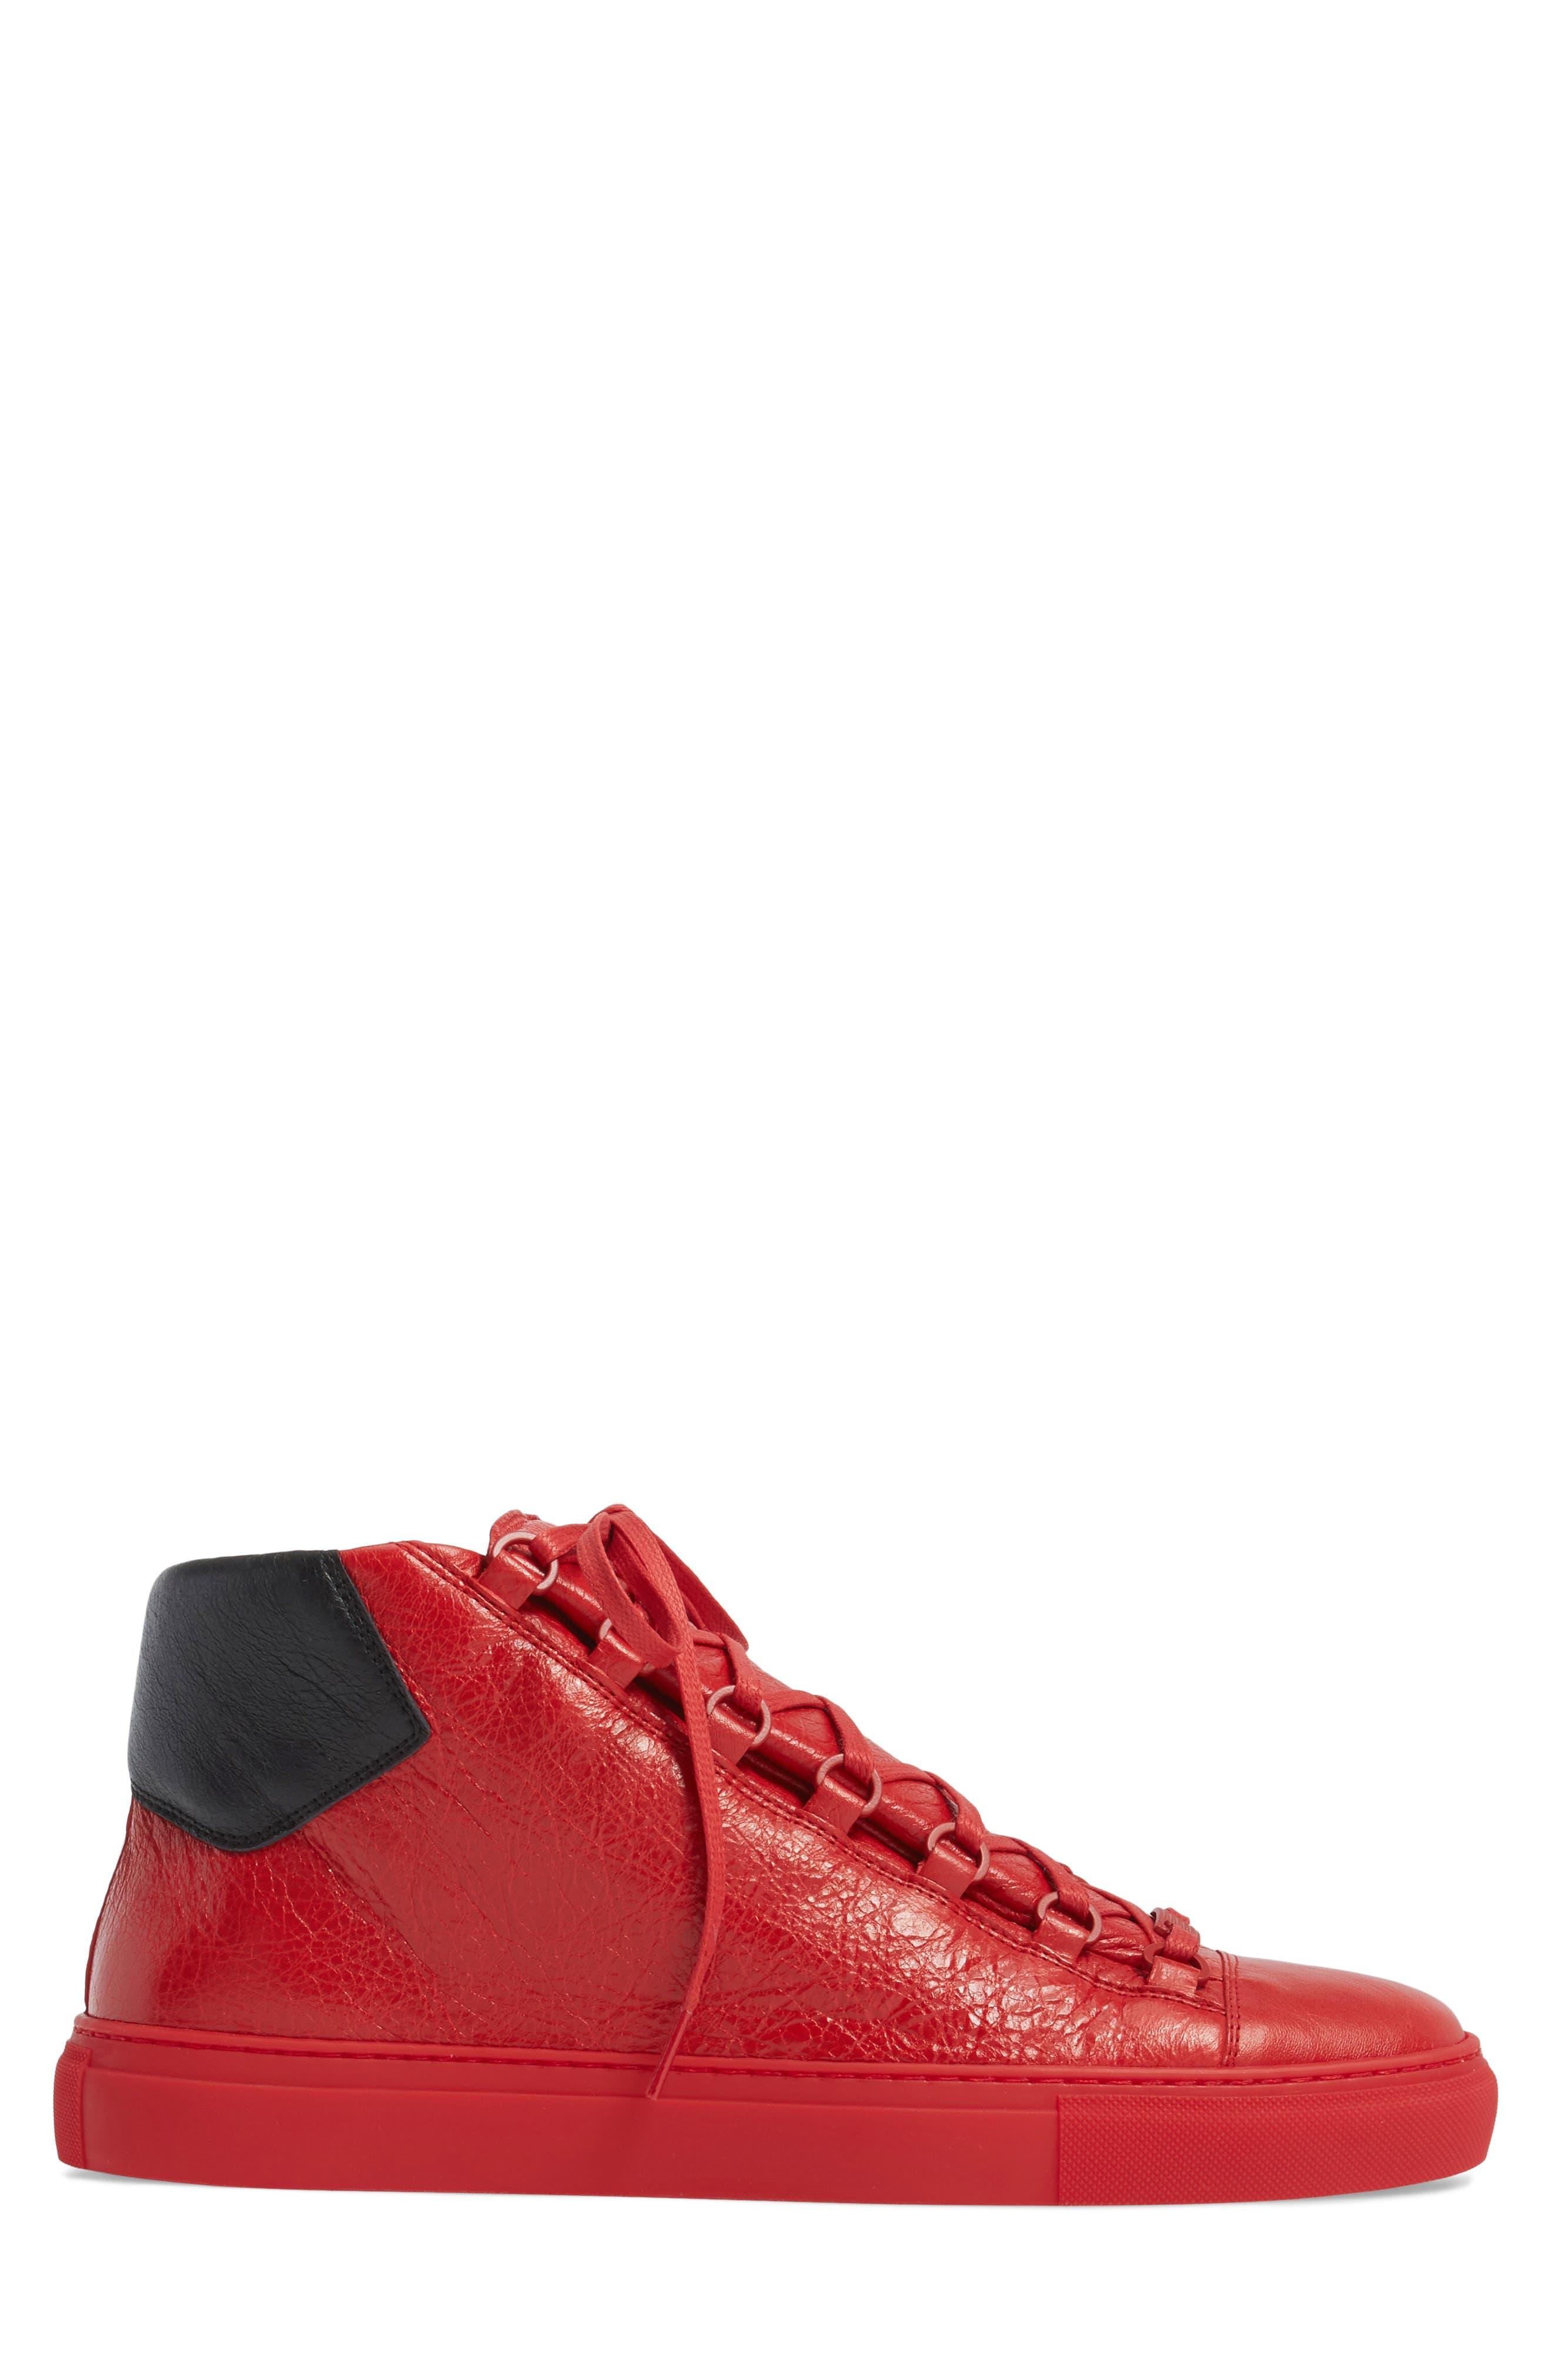 Arena High Sneaker,                             Alternate thumbnail 3, color,                             Rouge Paprika/ Noir Leather